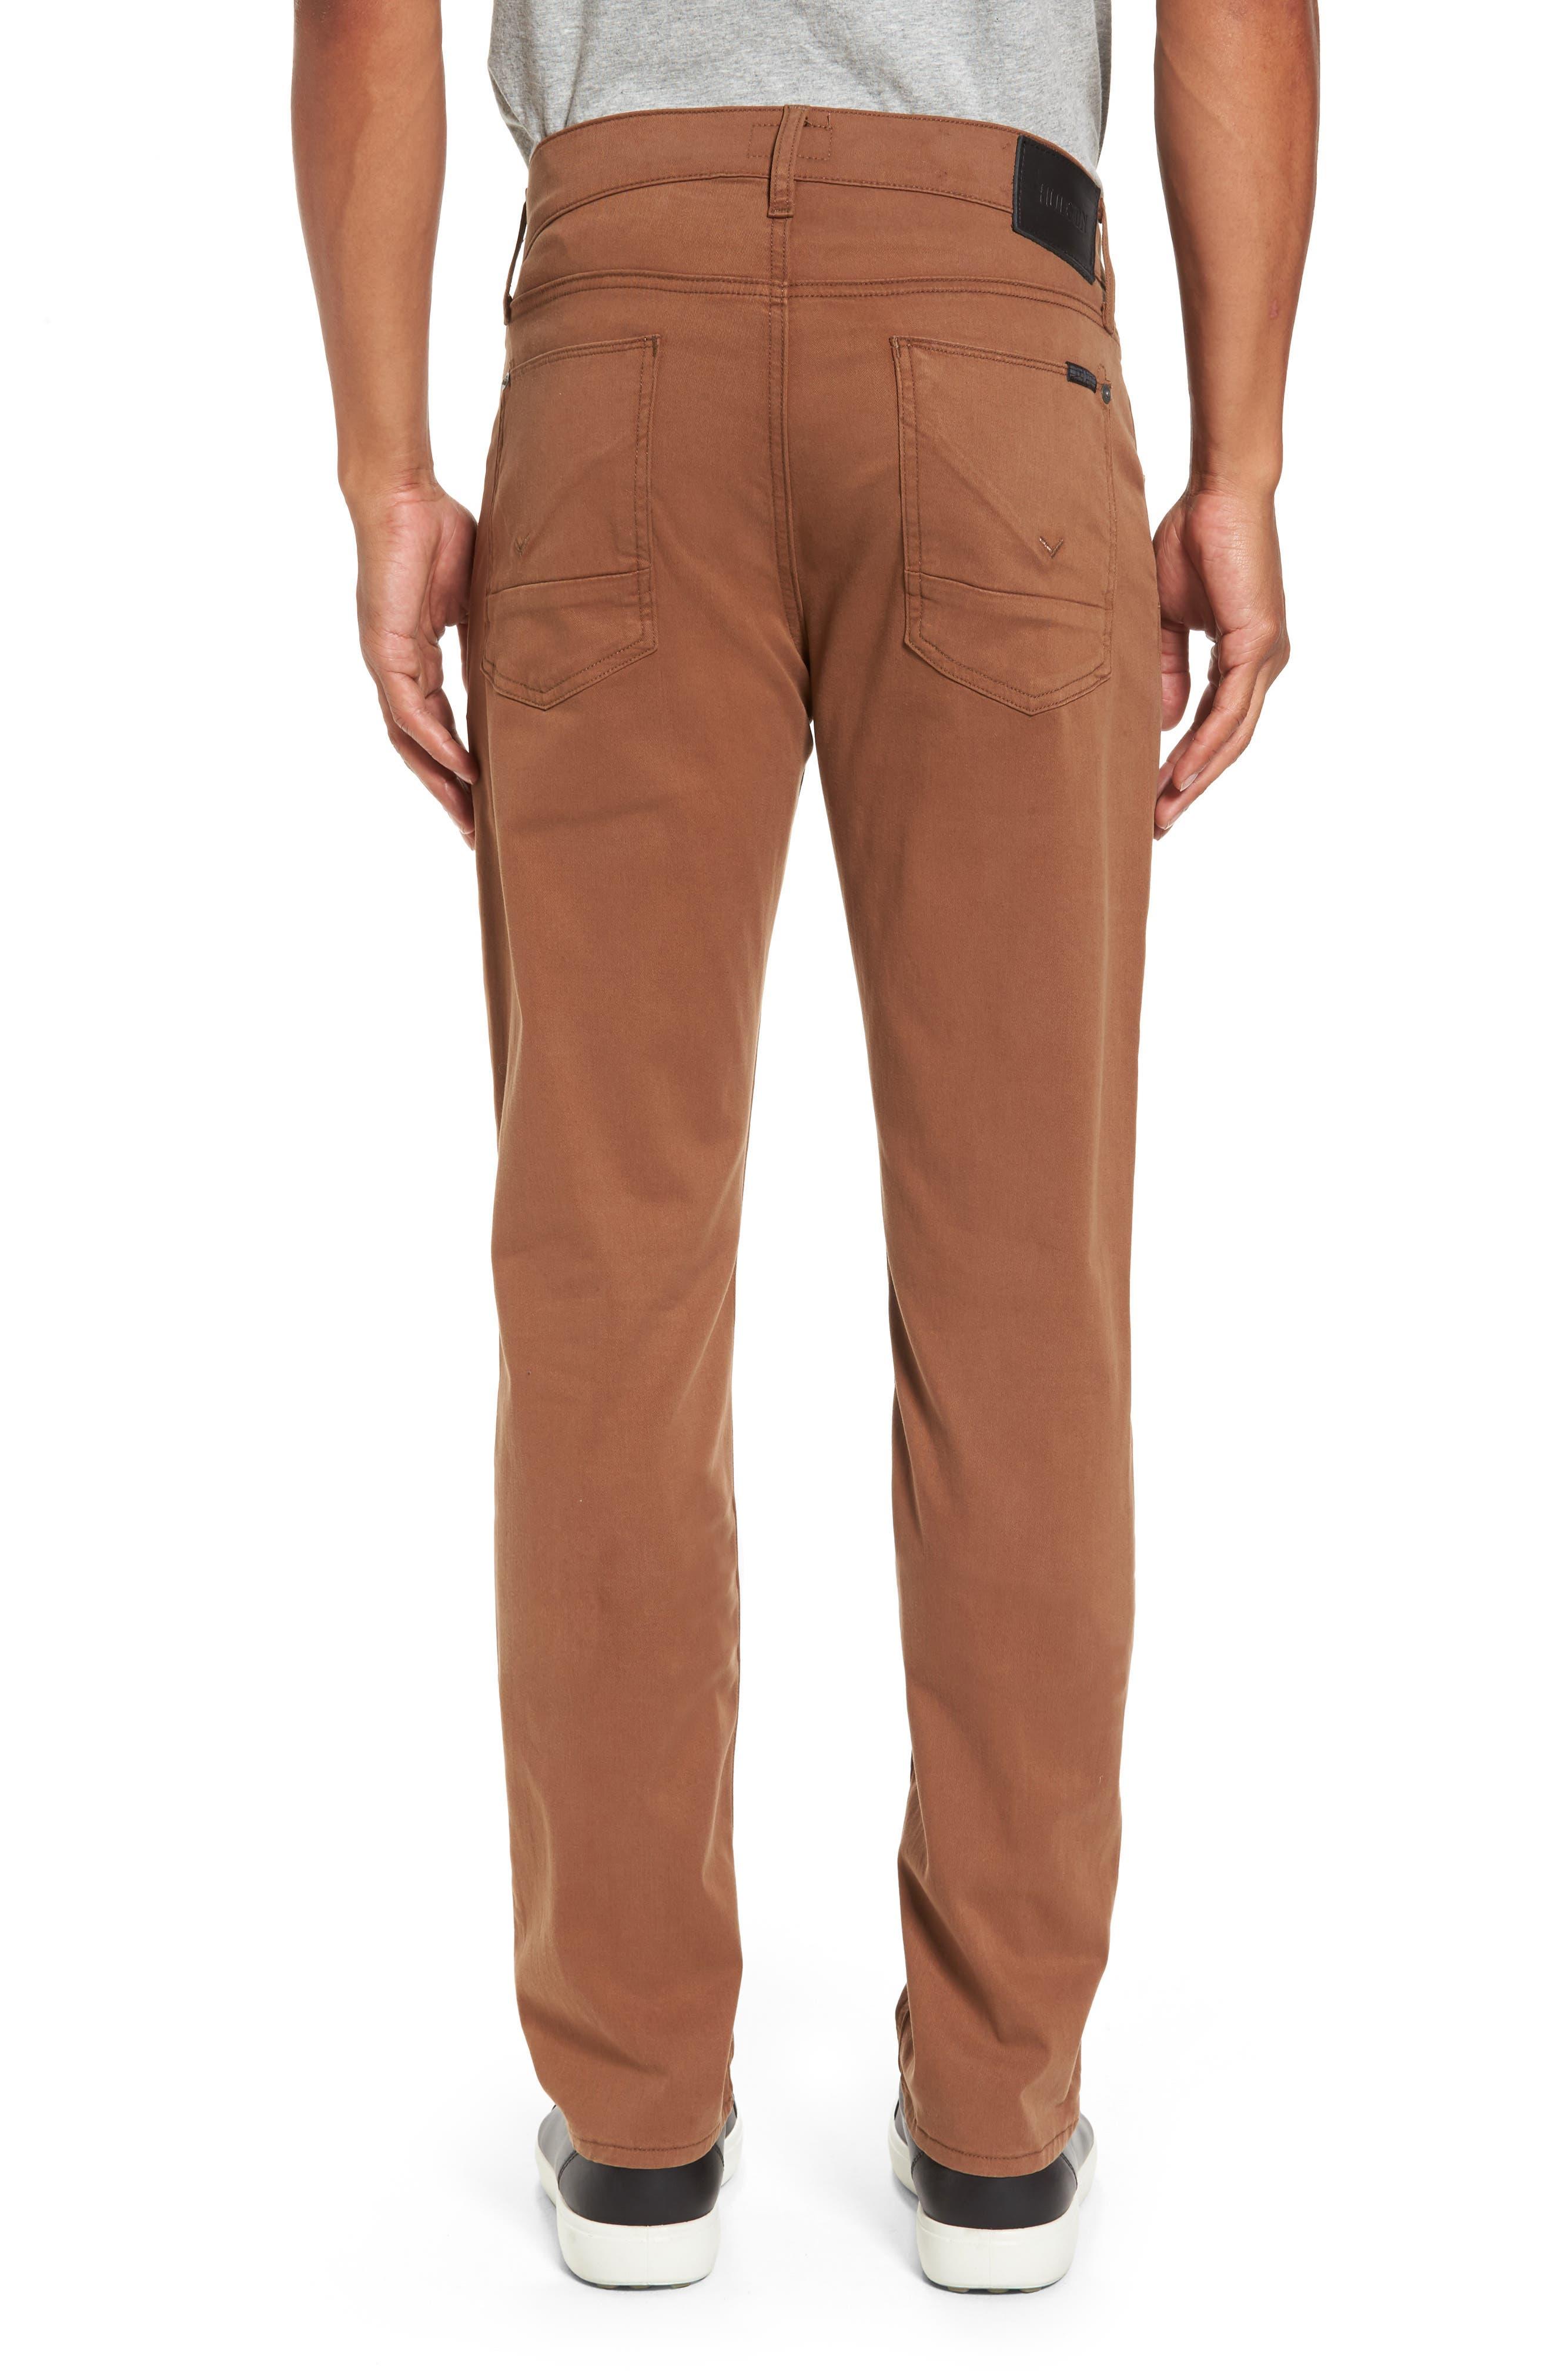 Blake Slim Fit Jeans,                             Alternate thumbnail 2, color,                             Masonite